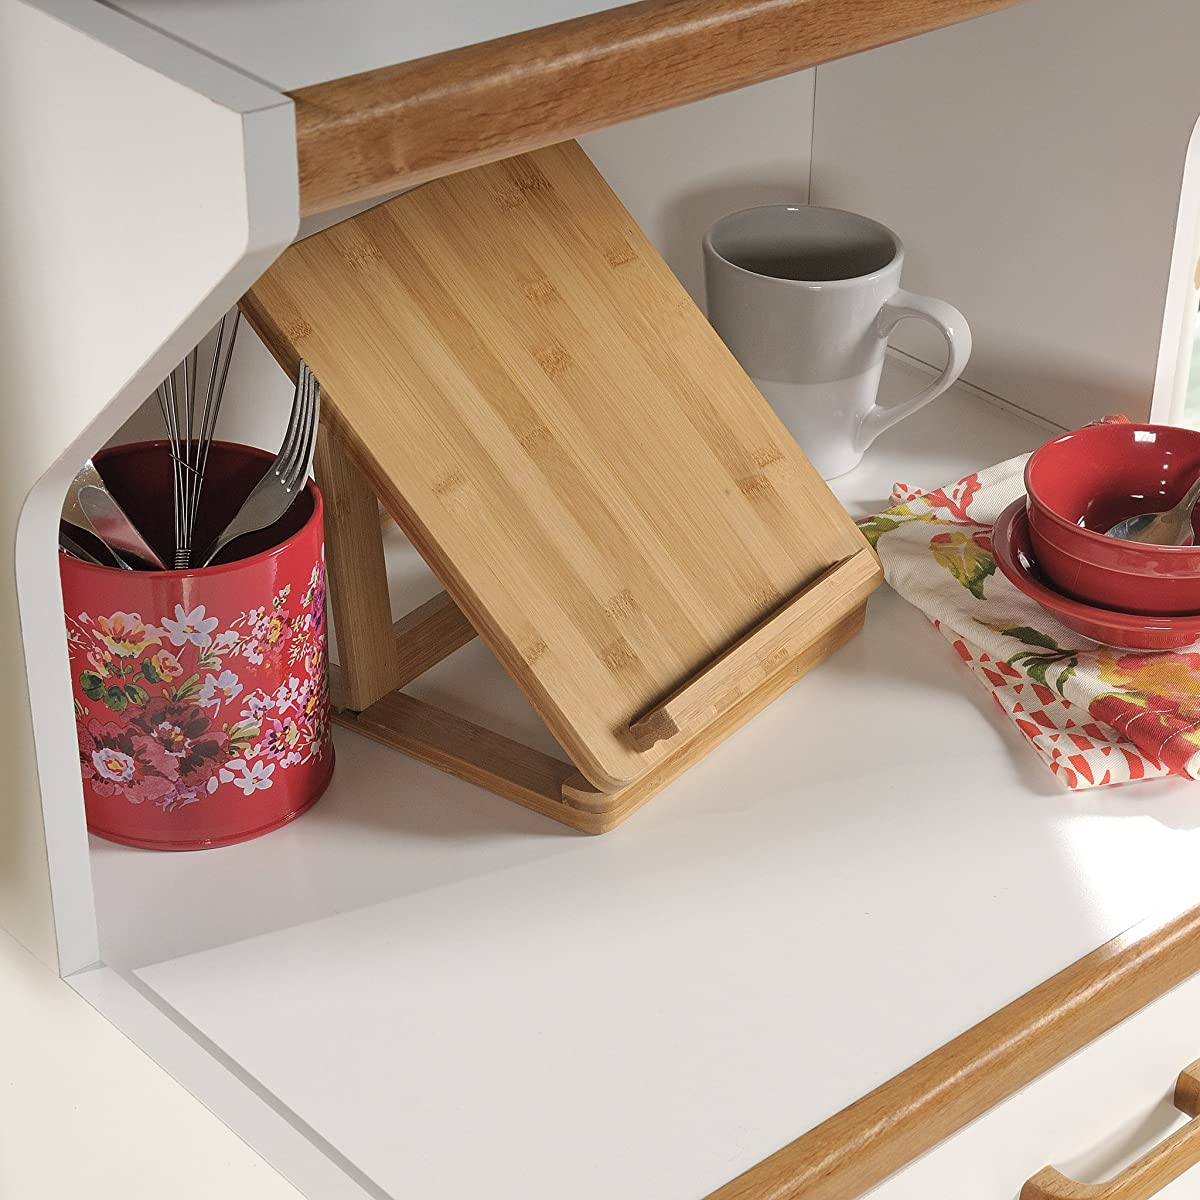 Sauder Universal Oven Cart, White